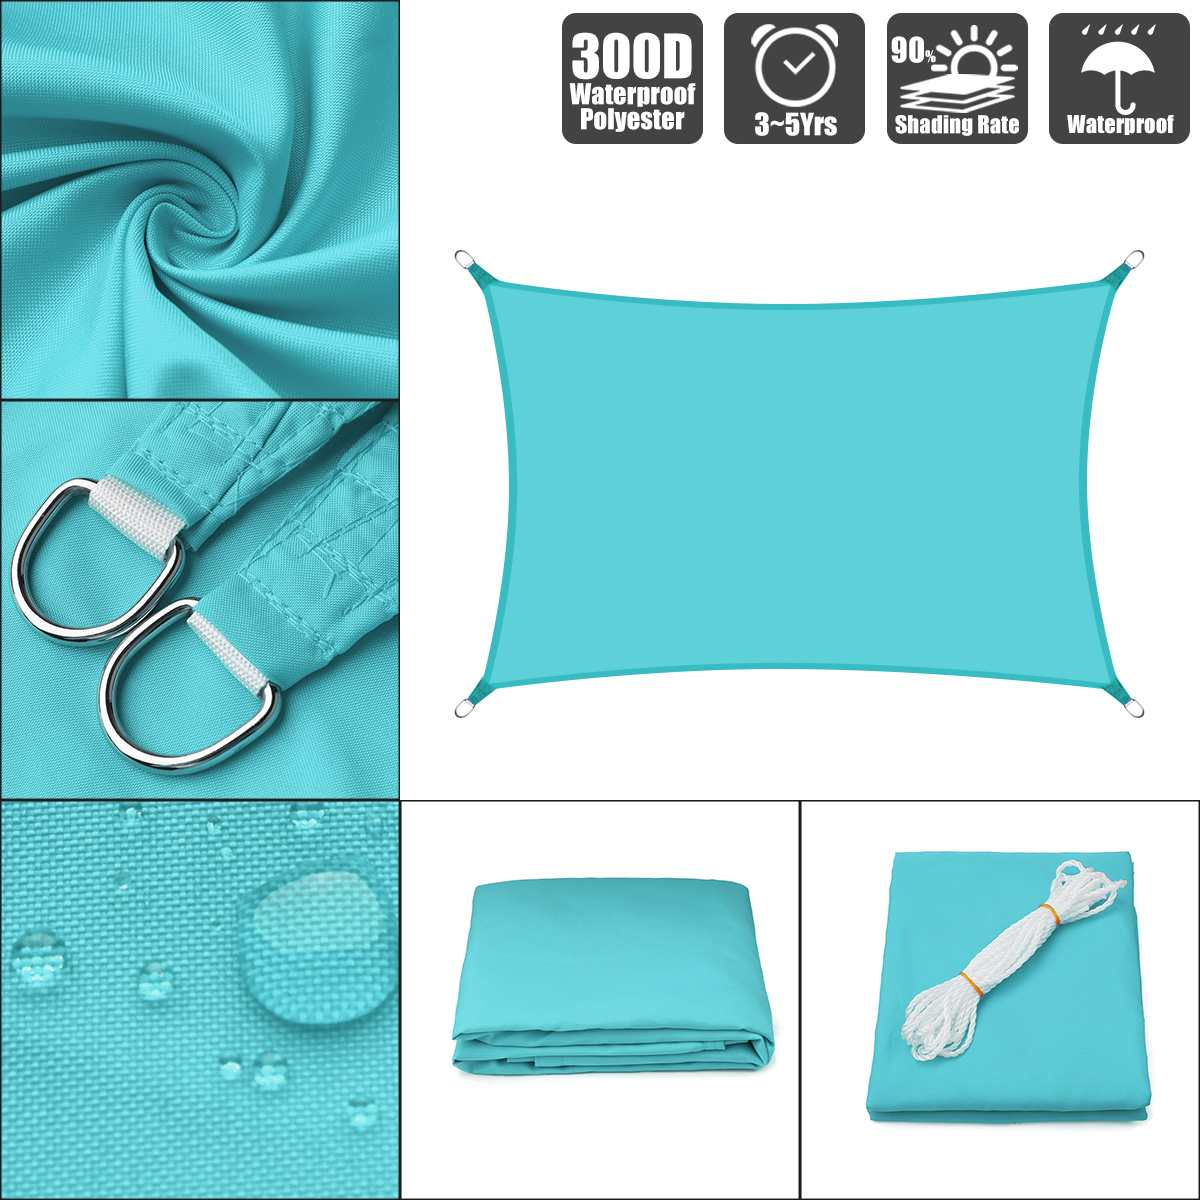 2x3 2x4 2x5 2.5x3 3x4 3x5 3x6 Sky Blue 300D 160GSM Polyester Oxford Fabric Shade Sail Sun Outdoor Rectangle2x3 2x4 2x5 2.5x3 3x4 3x5 3x6 Sky Blue 300D 160GSM Polyester Oxford Fabric Shade Sail Sun Outdoor Rectangle